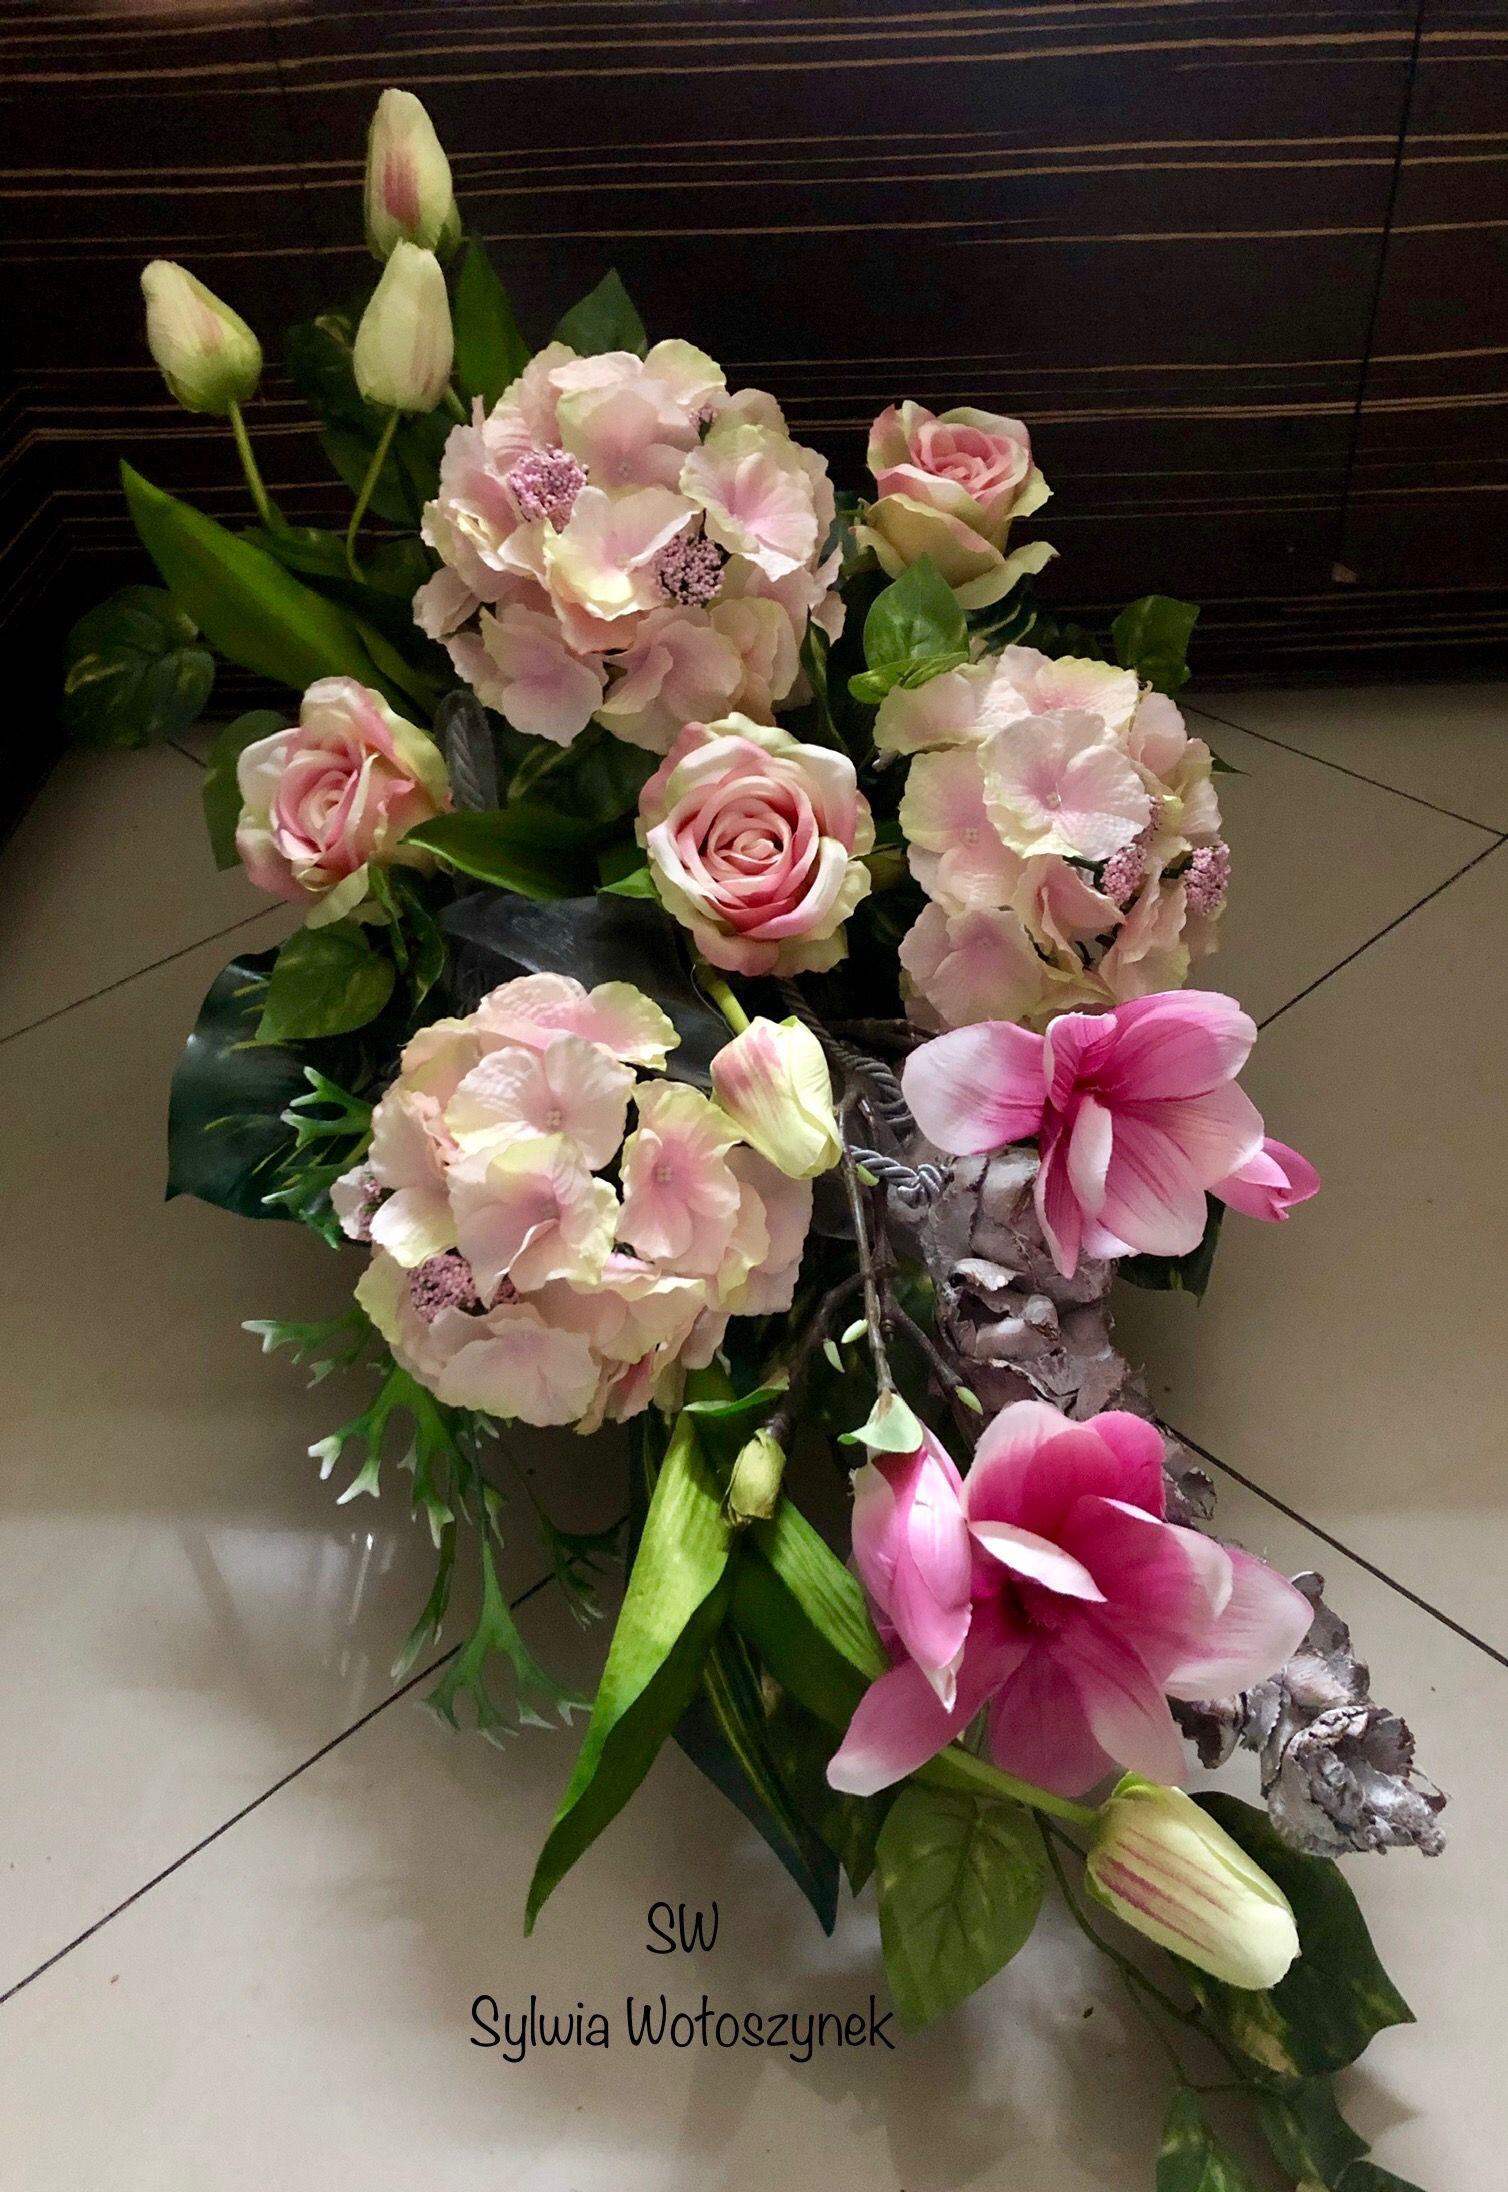 Kompozycja Nagrobna Wiosna 2019 Wyk Sylwia Woloszynek Flower Arrangements Fresh Flowers Arrangements Floral Arrangements